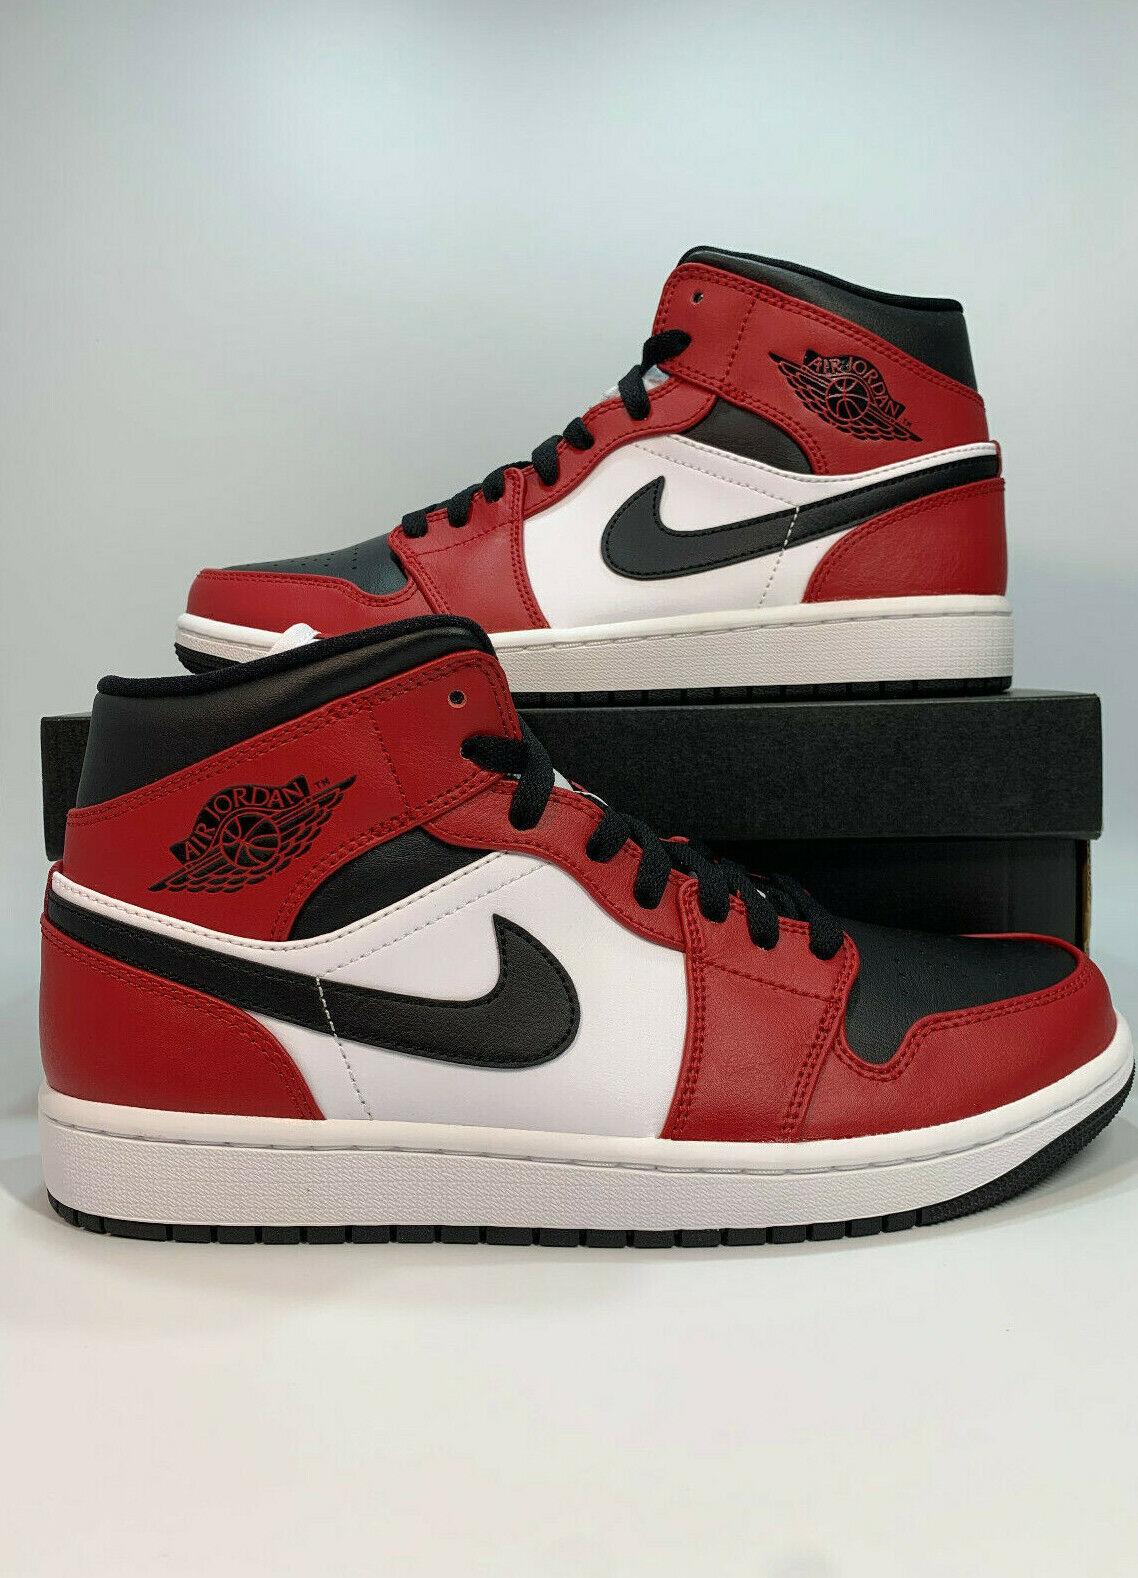 Nike Air Jordan I Retro 1 Mid Red White